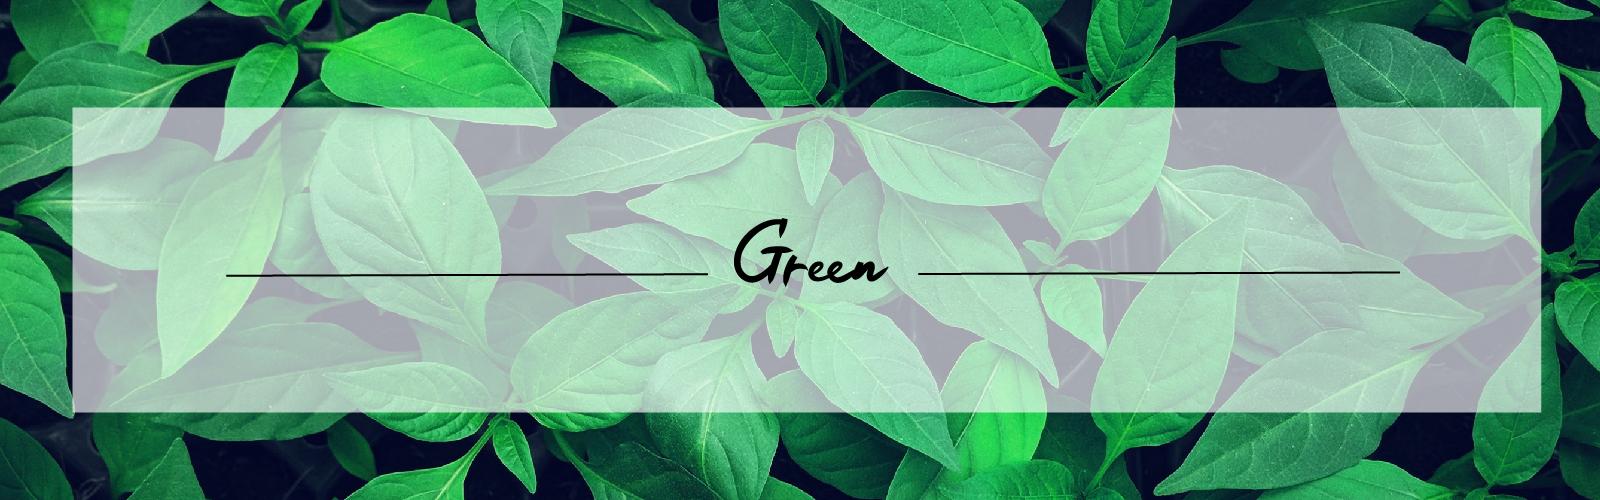 Green 1st